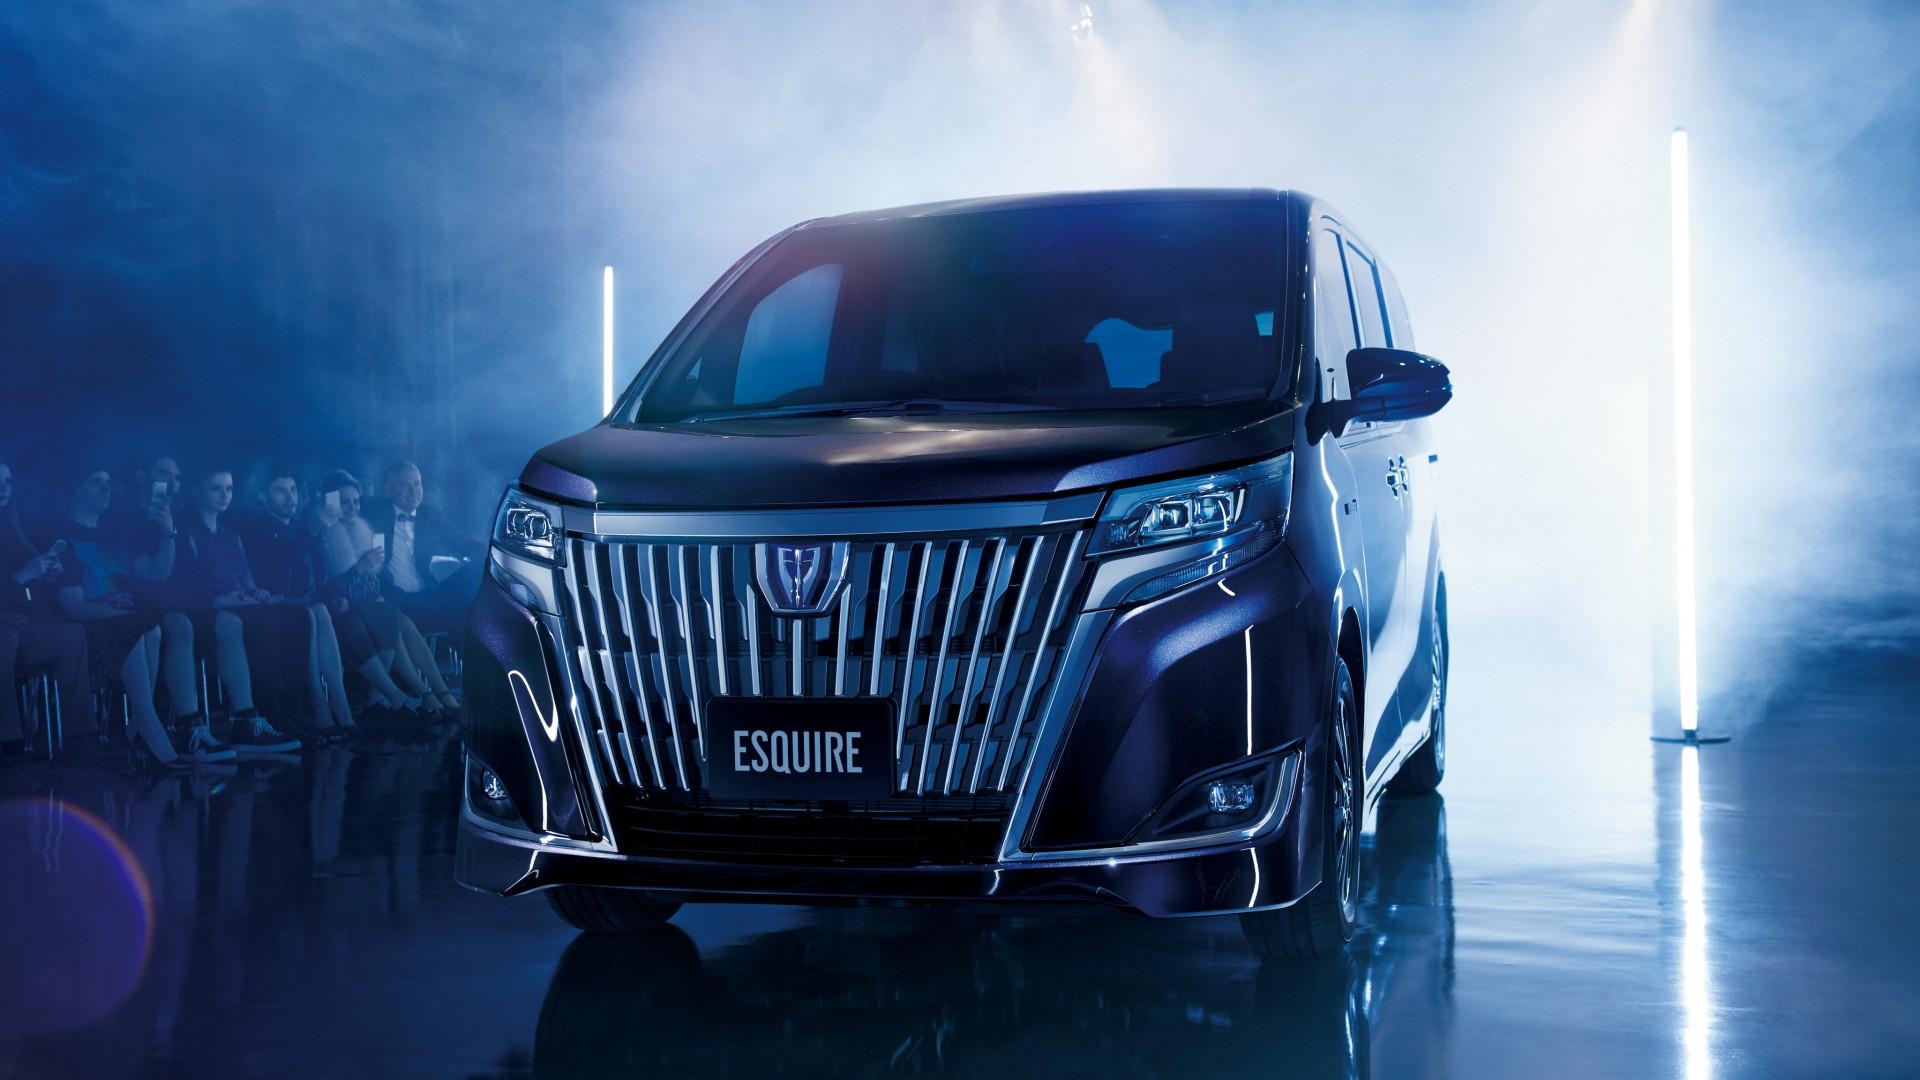 2017 Toyota Esquire Hybrid 4k Wallpaper Hd Car